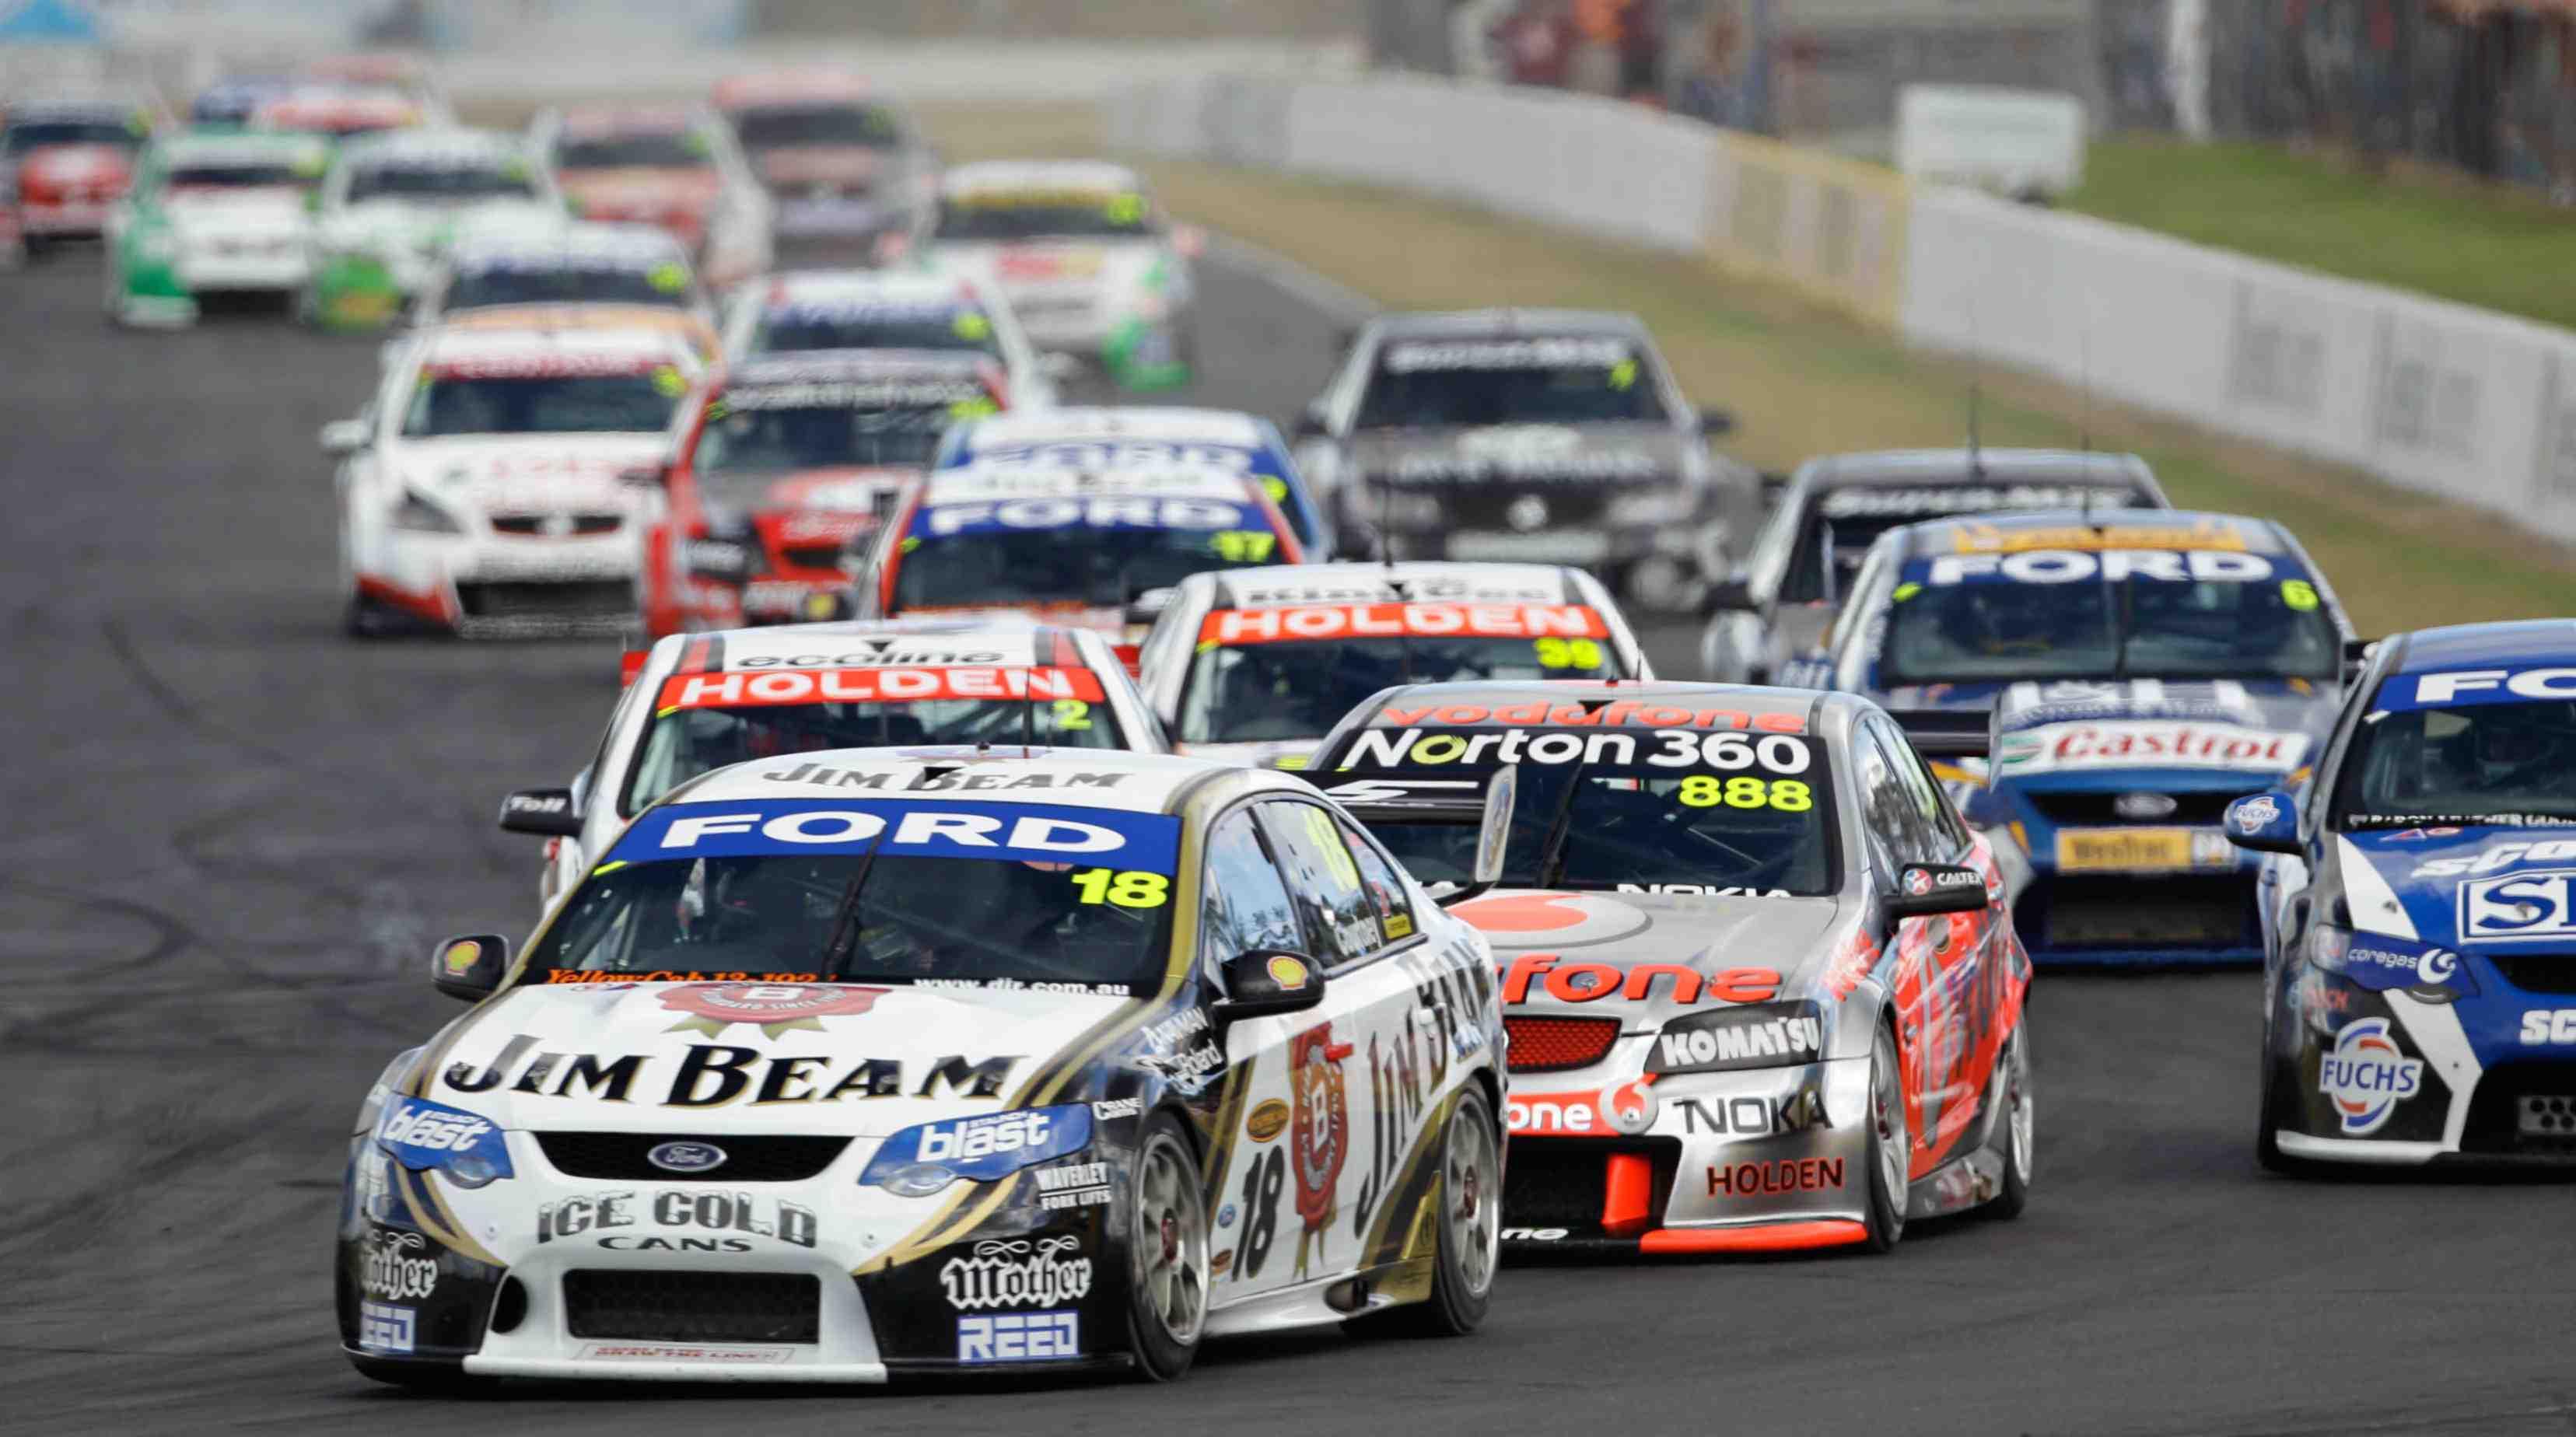 Aussie V8 Supercars race racing v 8 fs wallpaper 3312x1848 132159 3312x1848